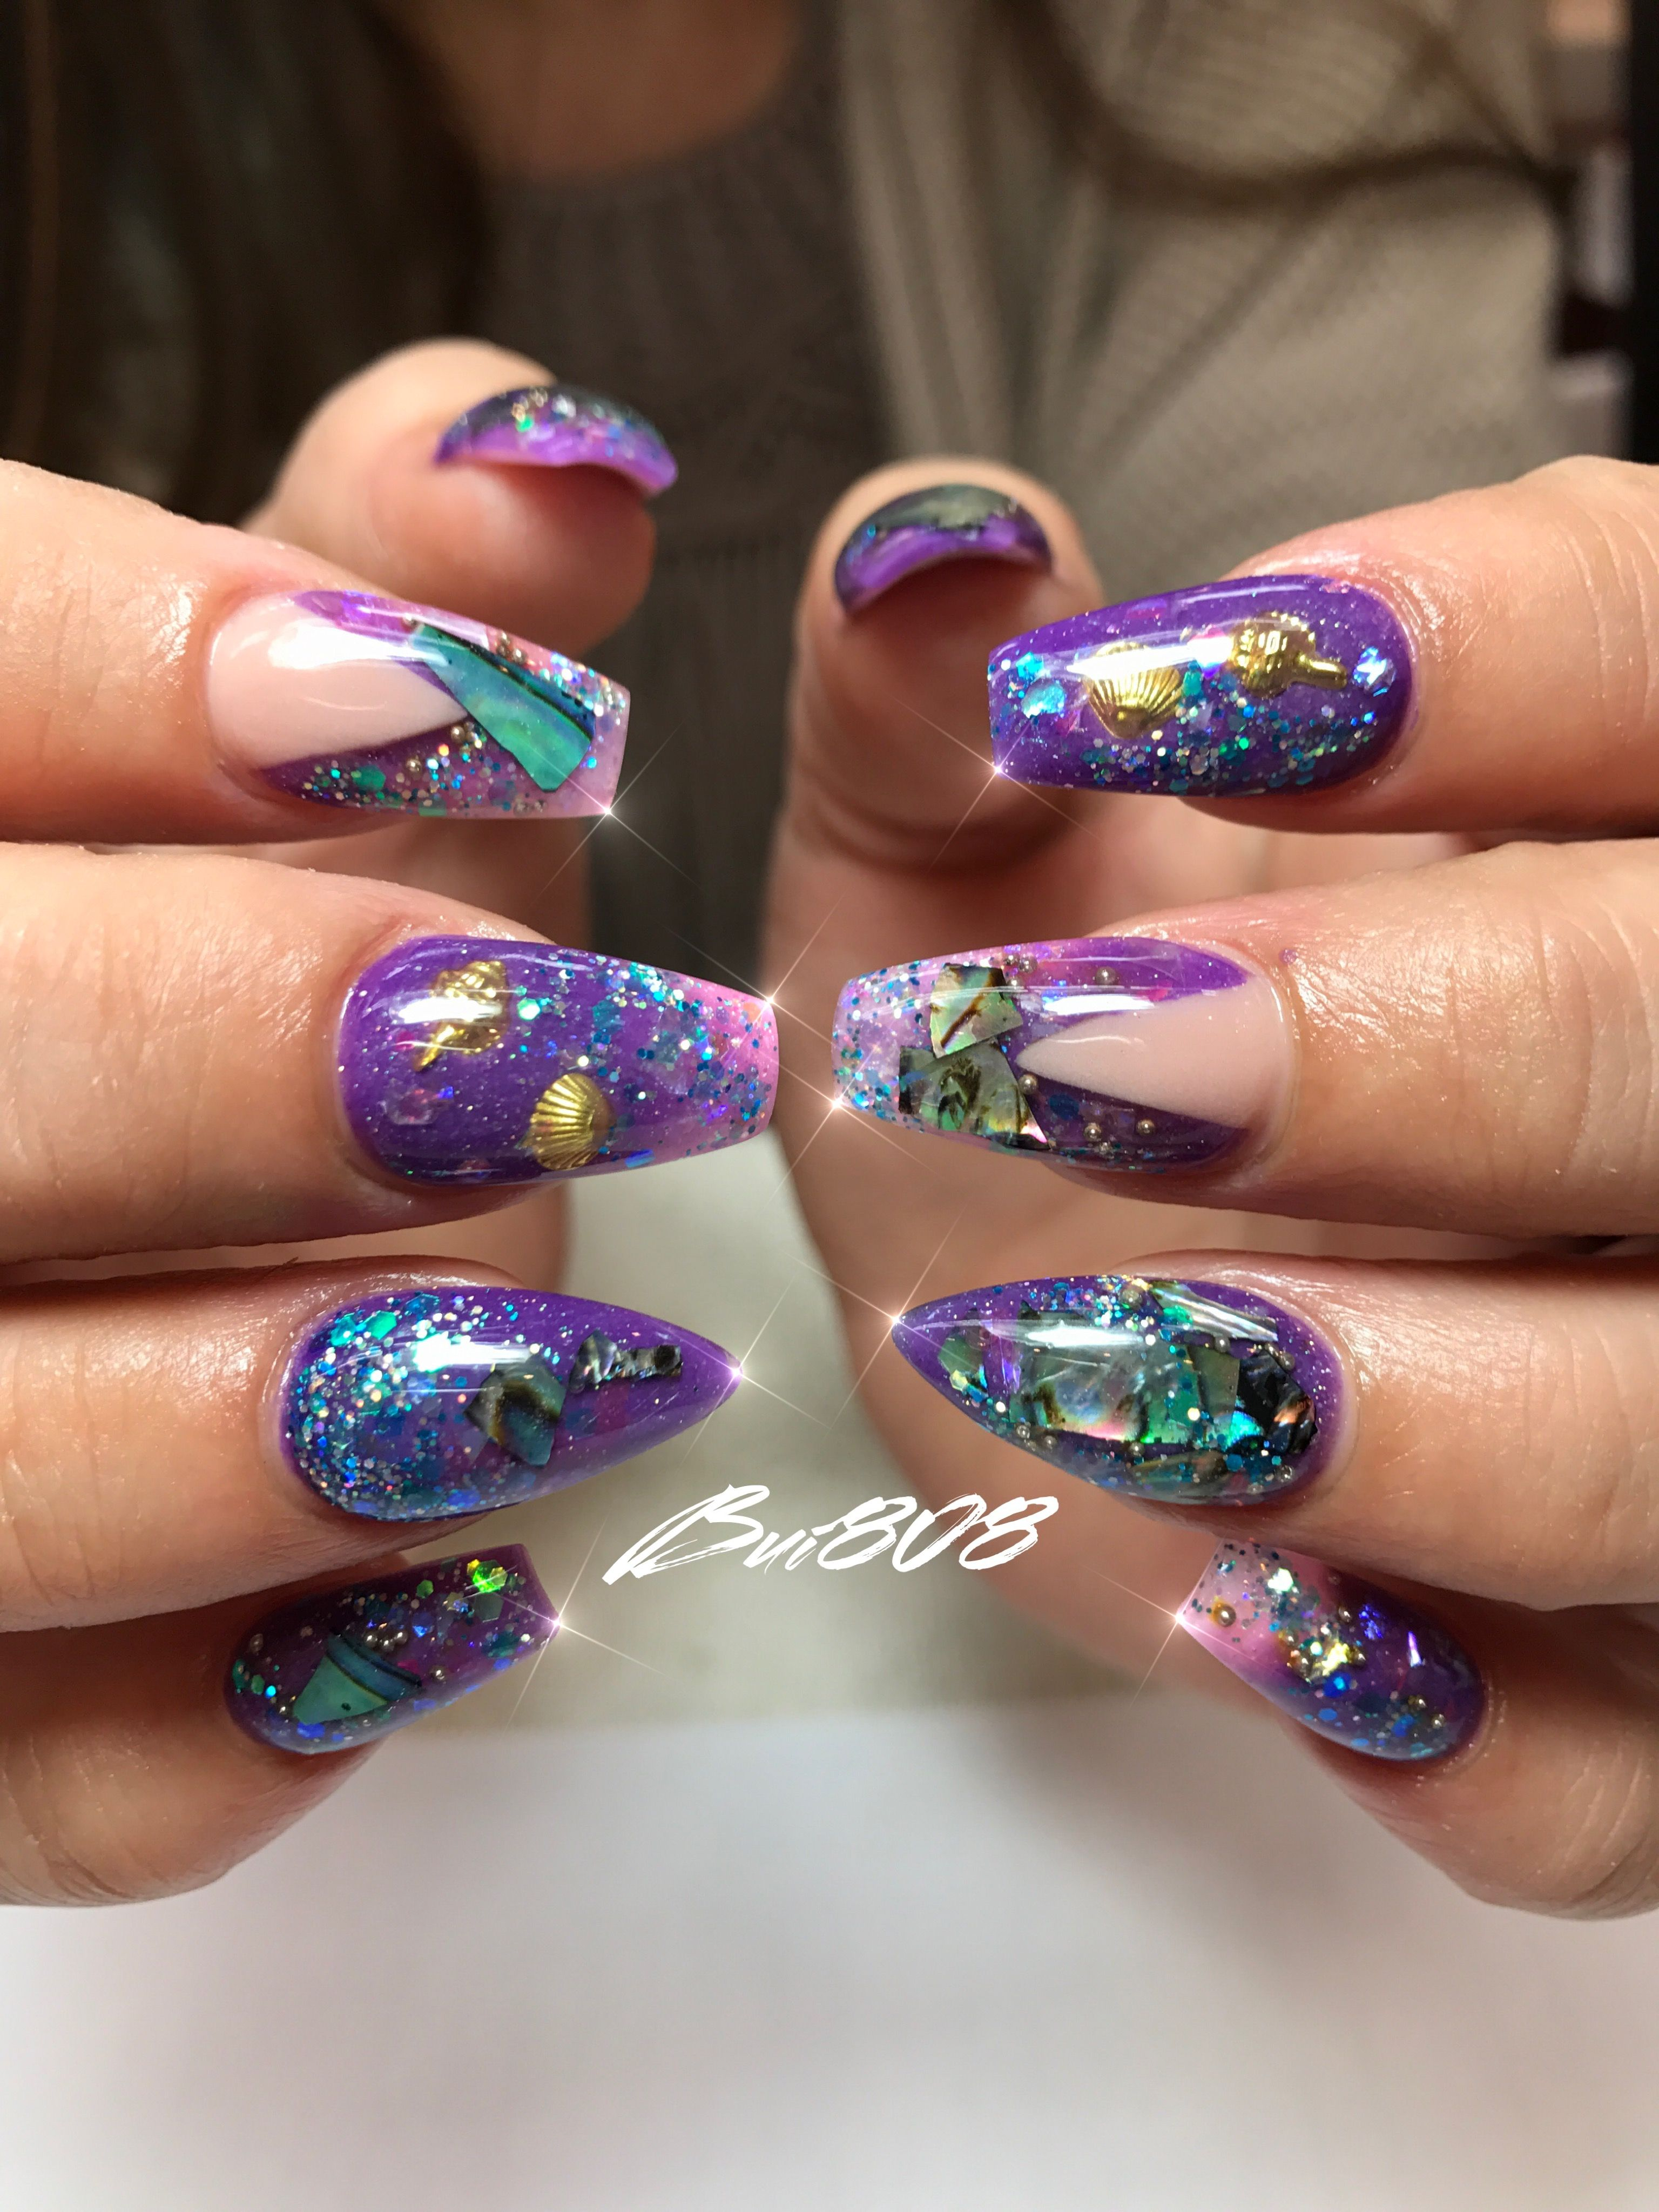 Pin by Bui808 Nails on Bui808 Nails | Pinterest | Fabulous nails ...